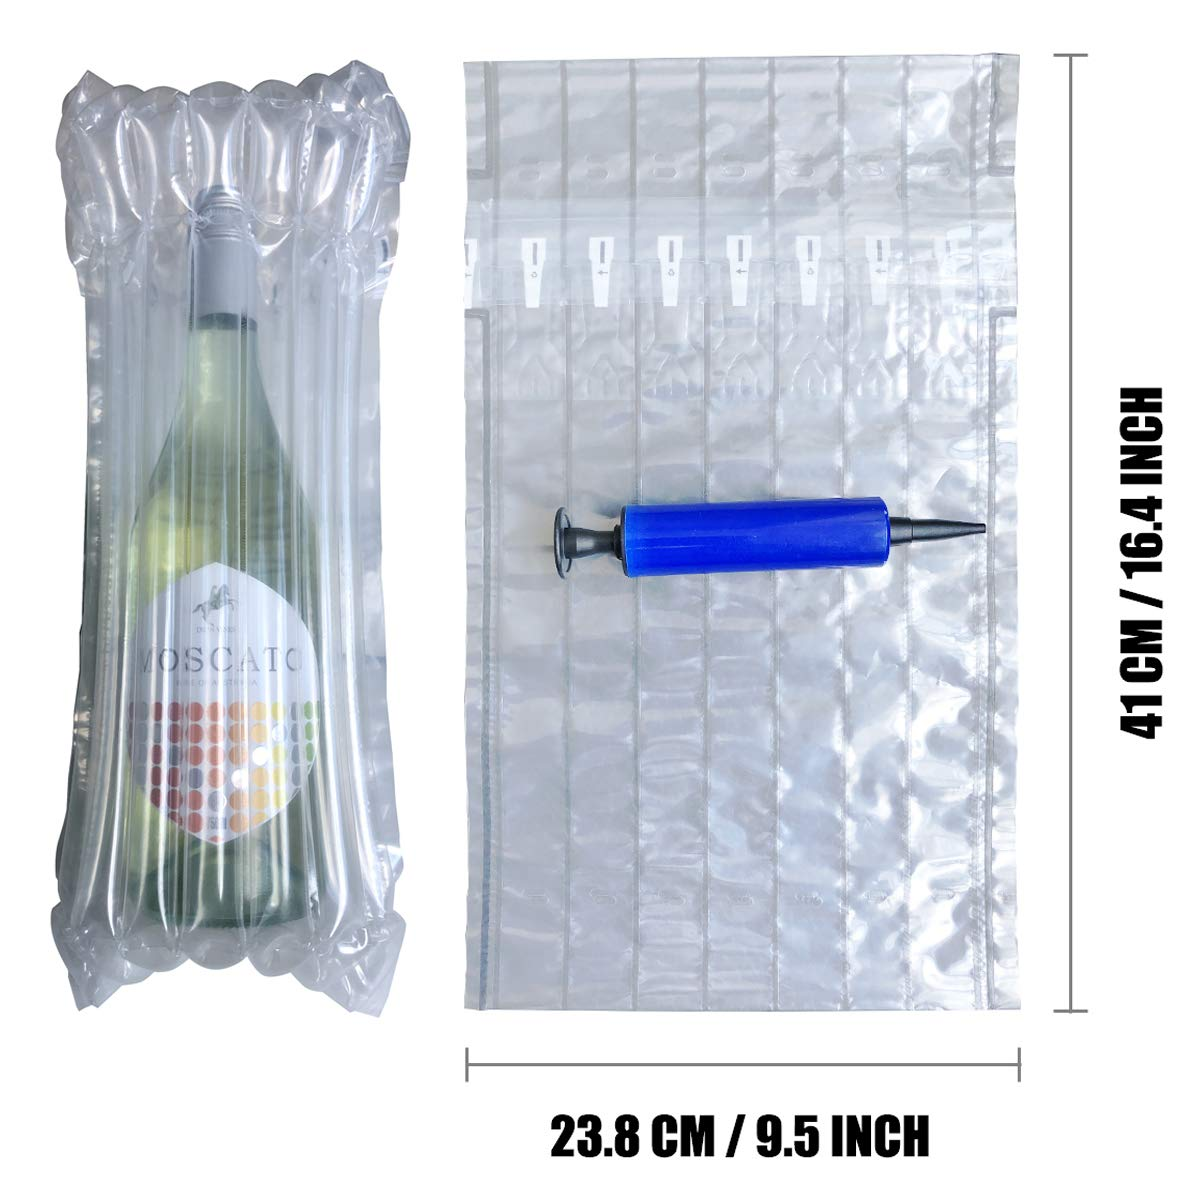 envoltorio para botellas de cristal bolsas de aire amortiguadoras a prueba de golpes 15 unidades de fundas hinchables para botellas de vino Protector para botellas de vino